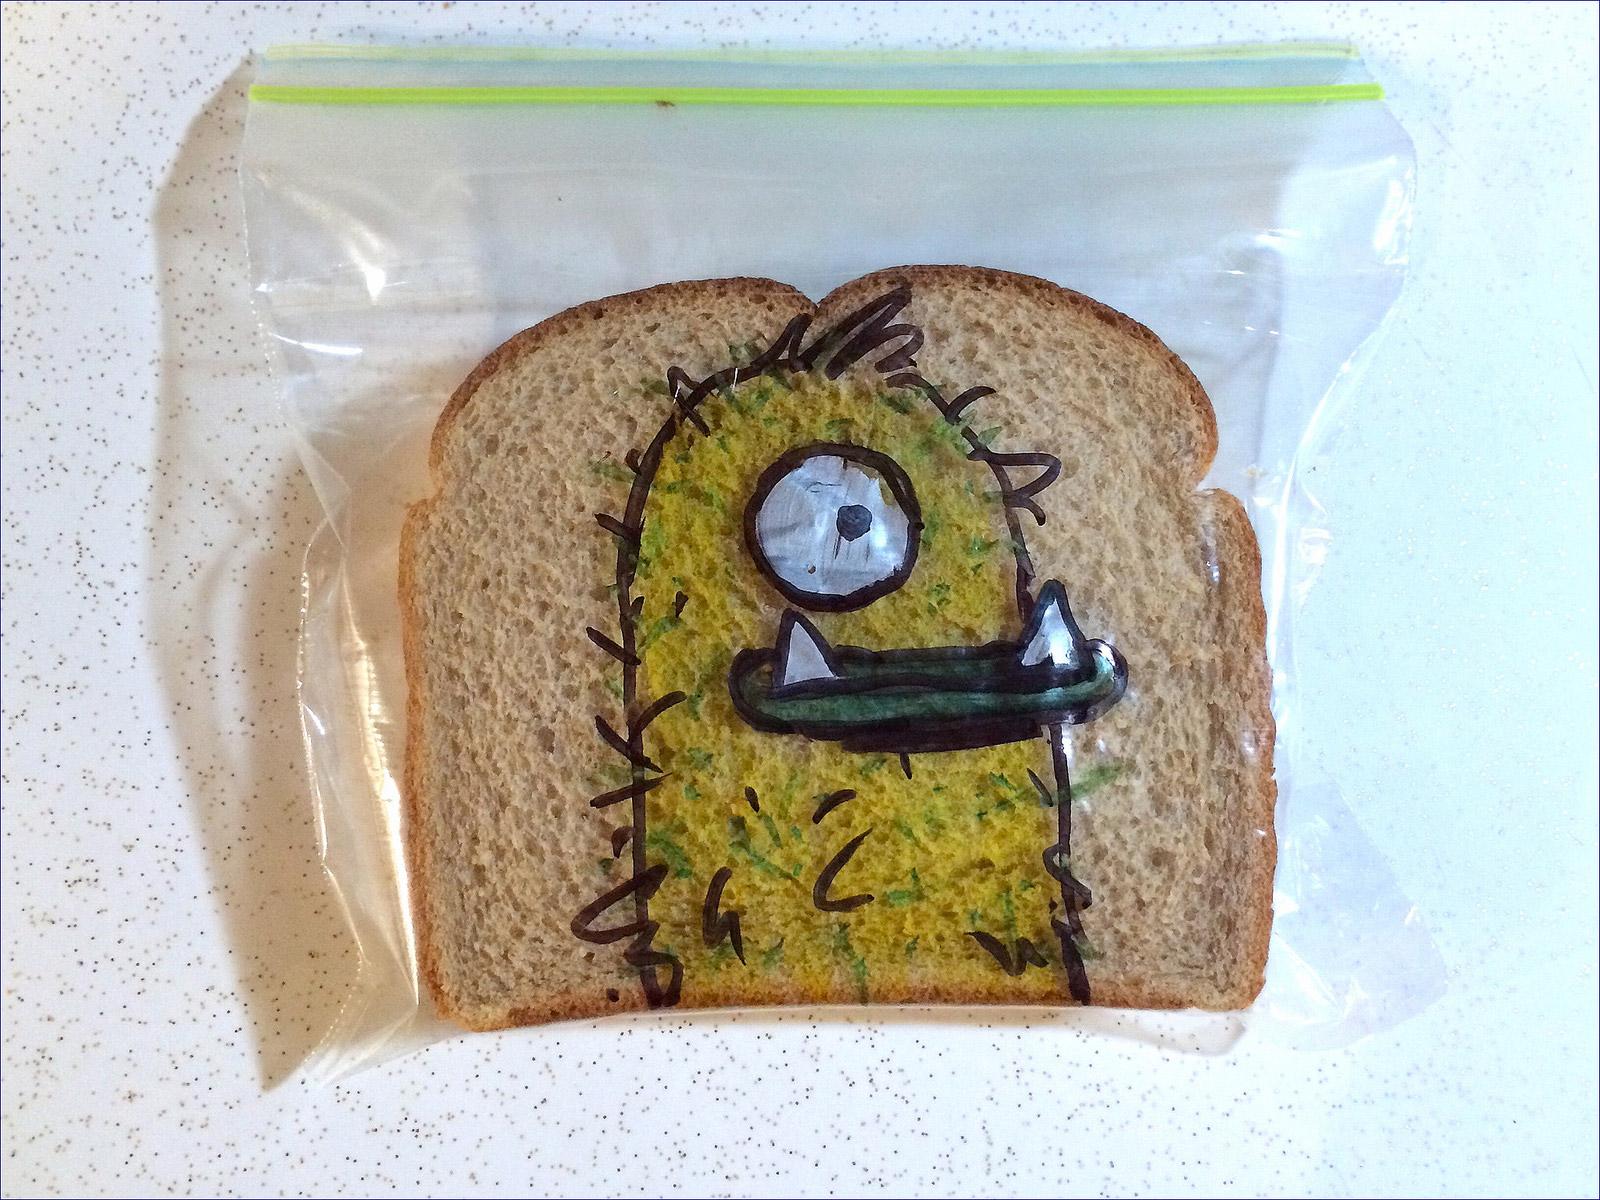 david-laferriere-creative-lunch-bag-illustration-17